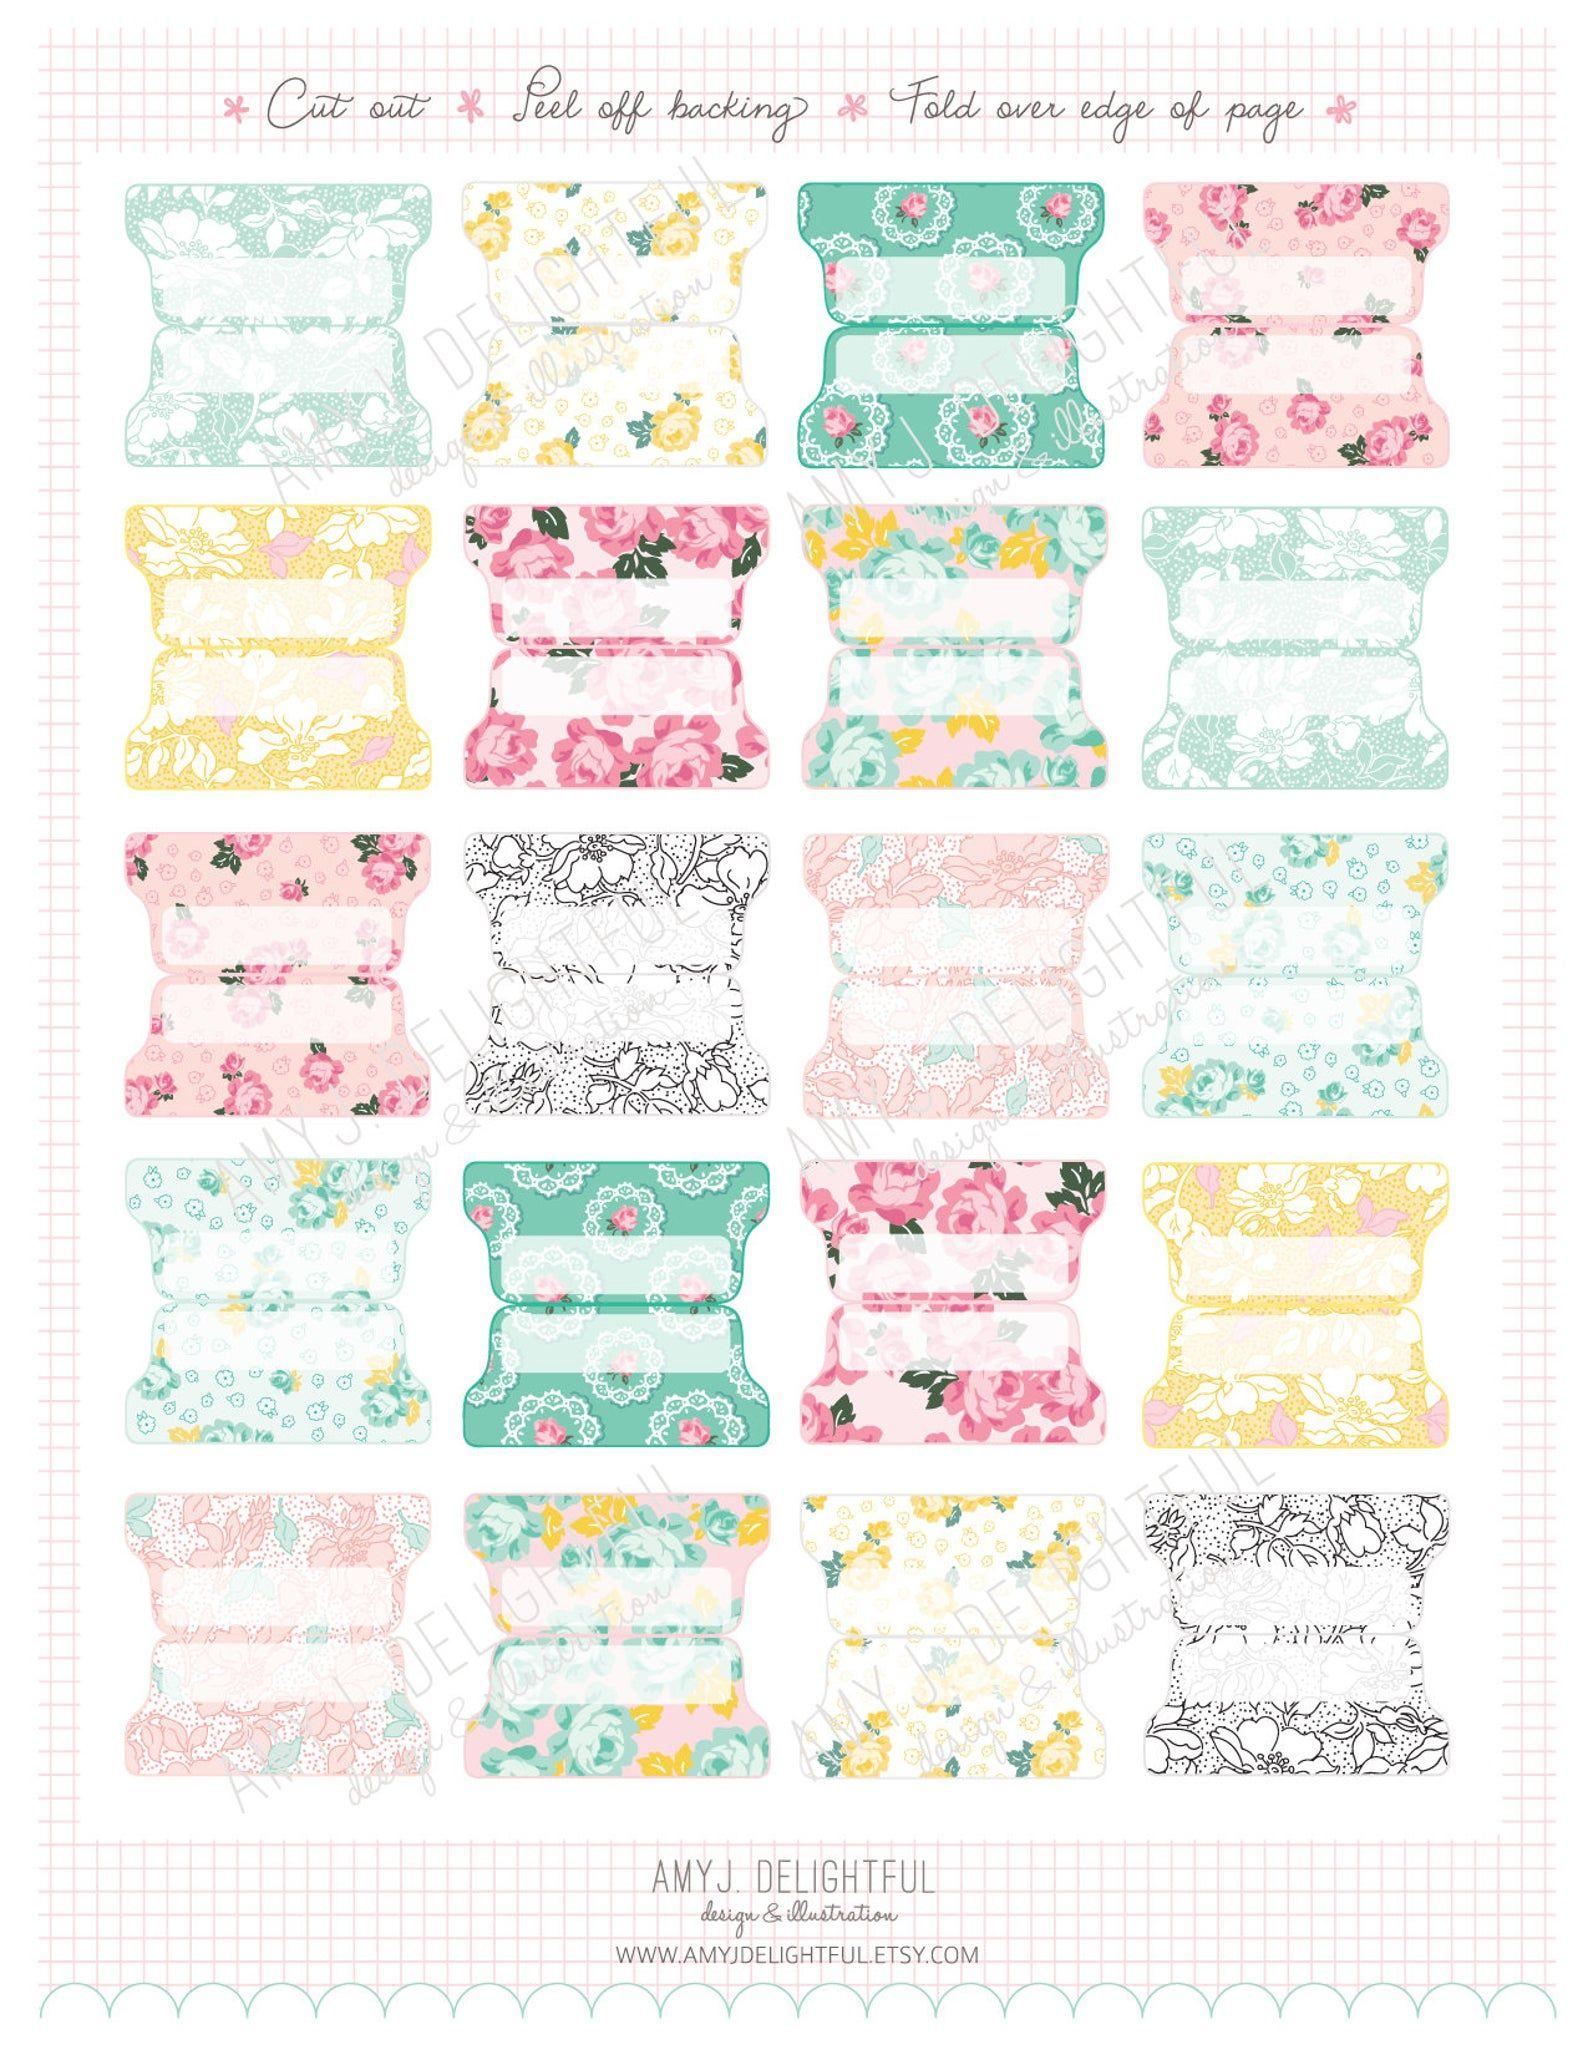 Small Size Printable 1940s Floral Planner File Tabs Digital File Instant Download Floral Pastels Home Management Organization Separadores De Carpetas Separador De Libros Divisores De Agenda